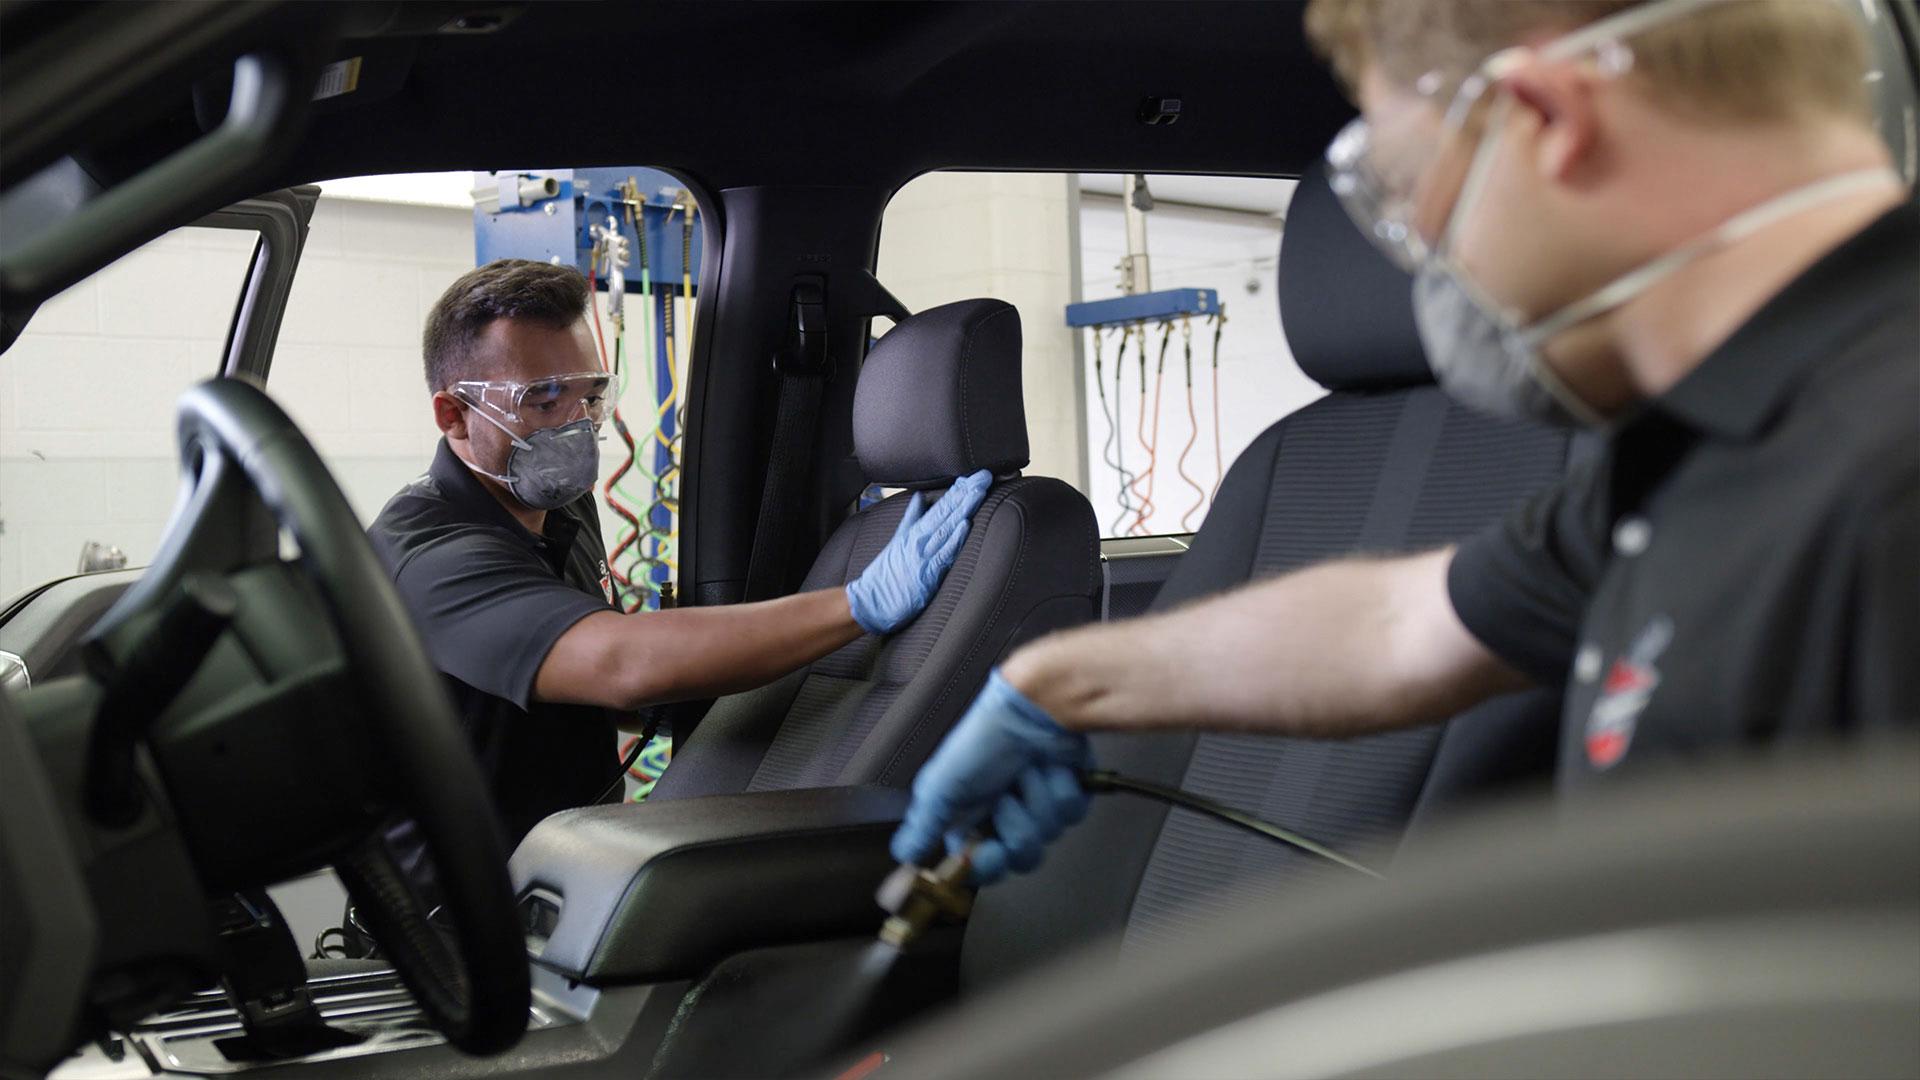 Interior Auto Detailing  Auto Care Services  Ziebart